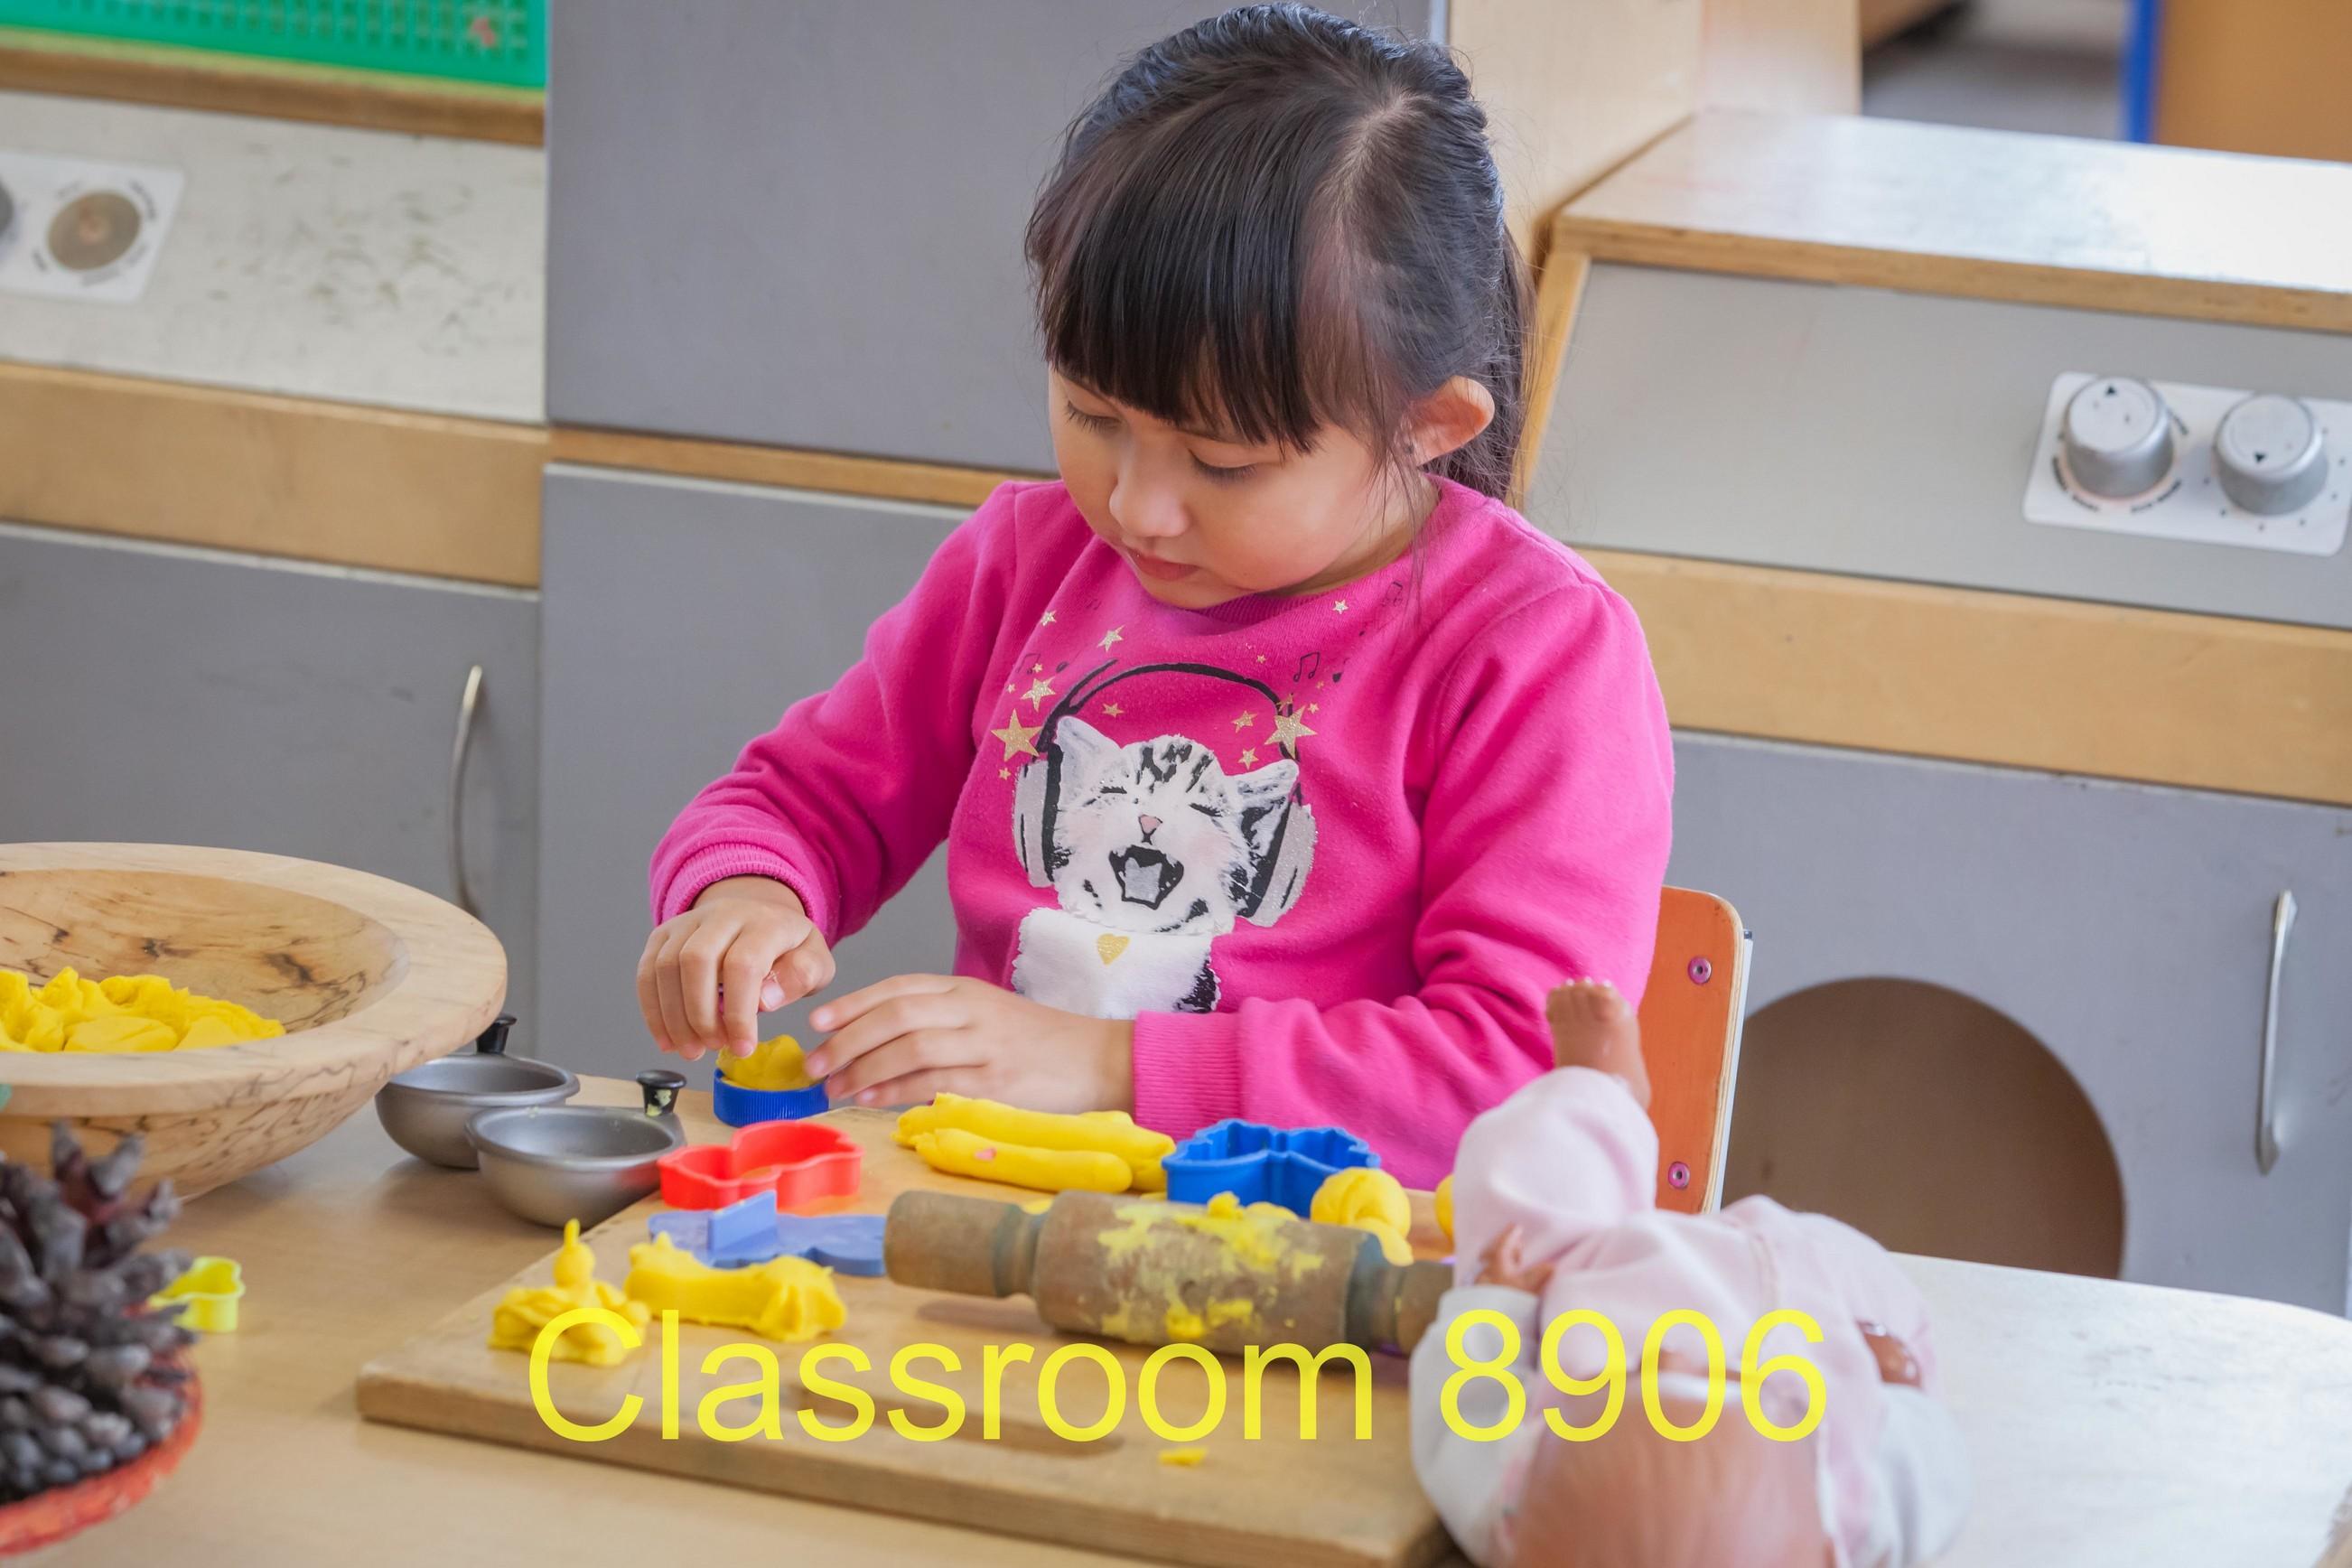 Classroom 8906